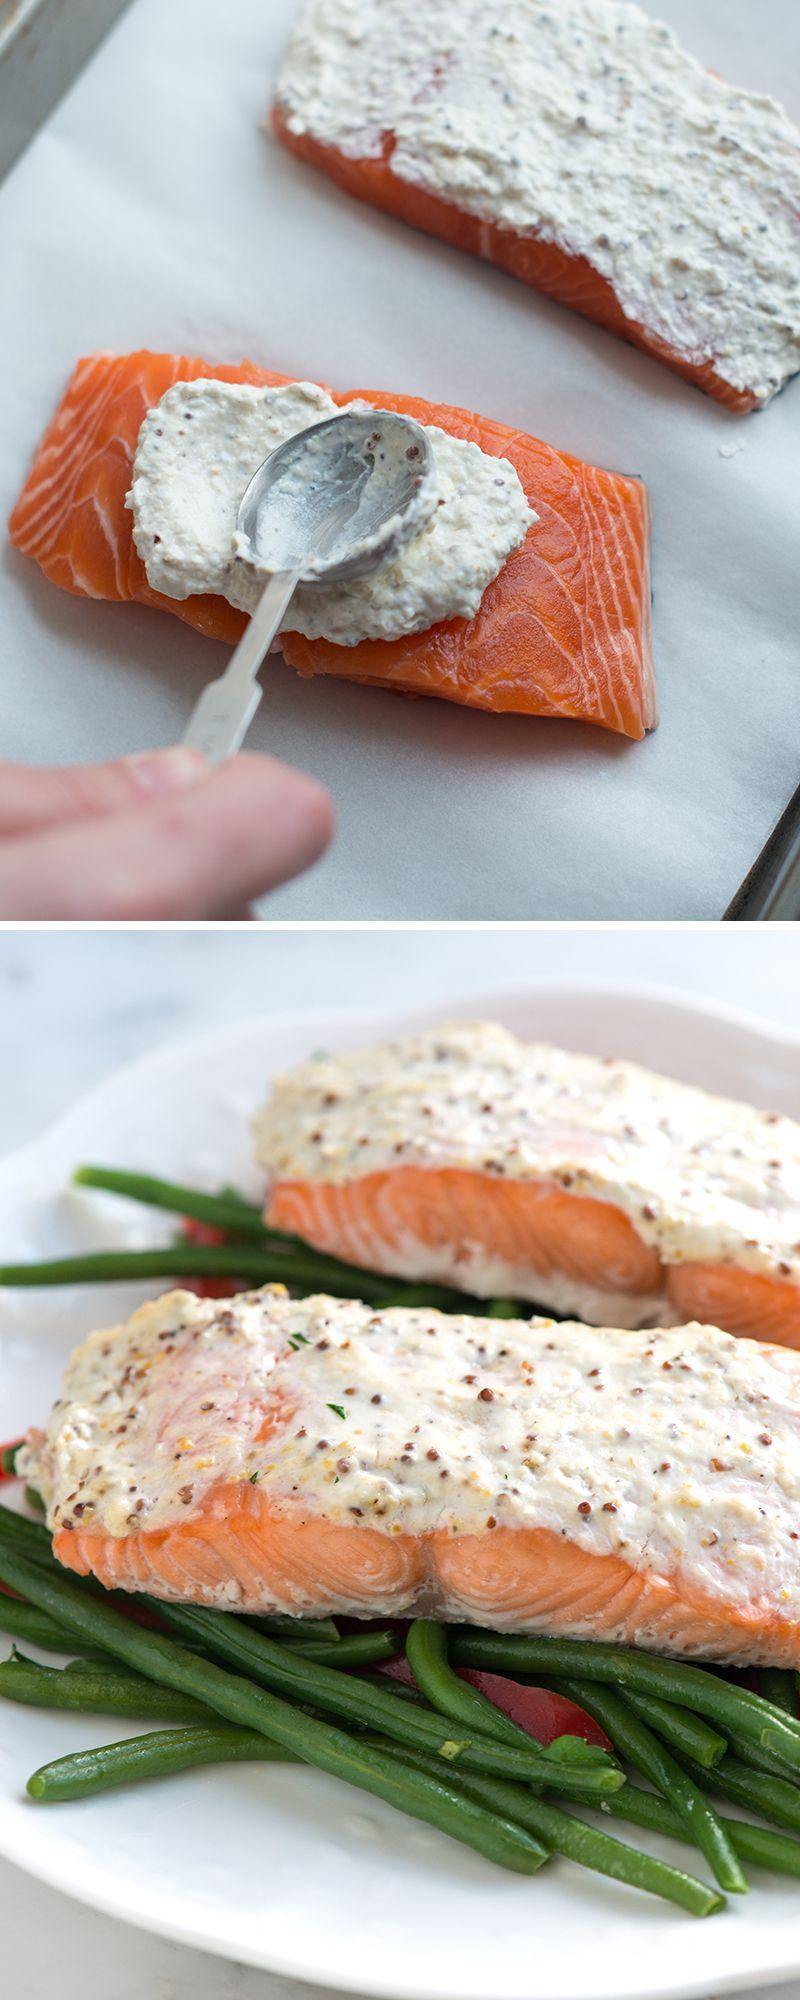 Easy Sour Cream Baked Salmon Recipe Baked Salmon Recipes